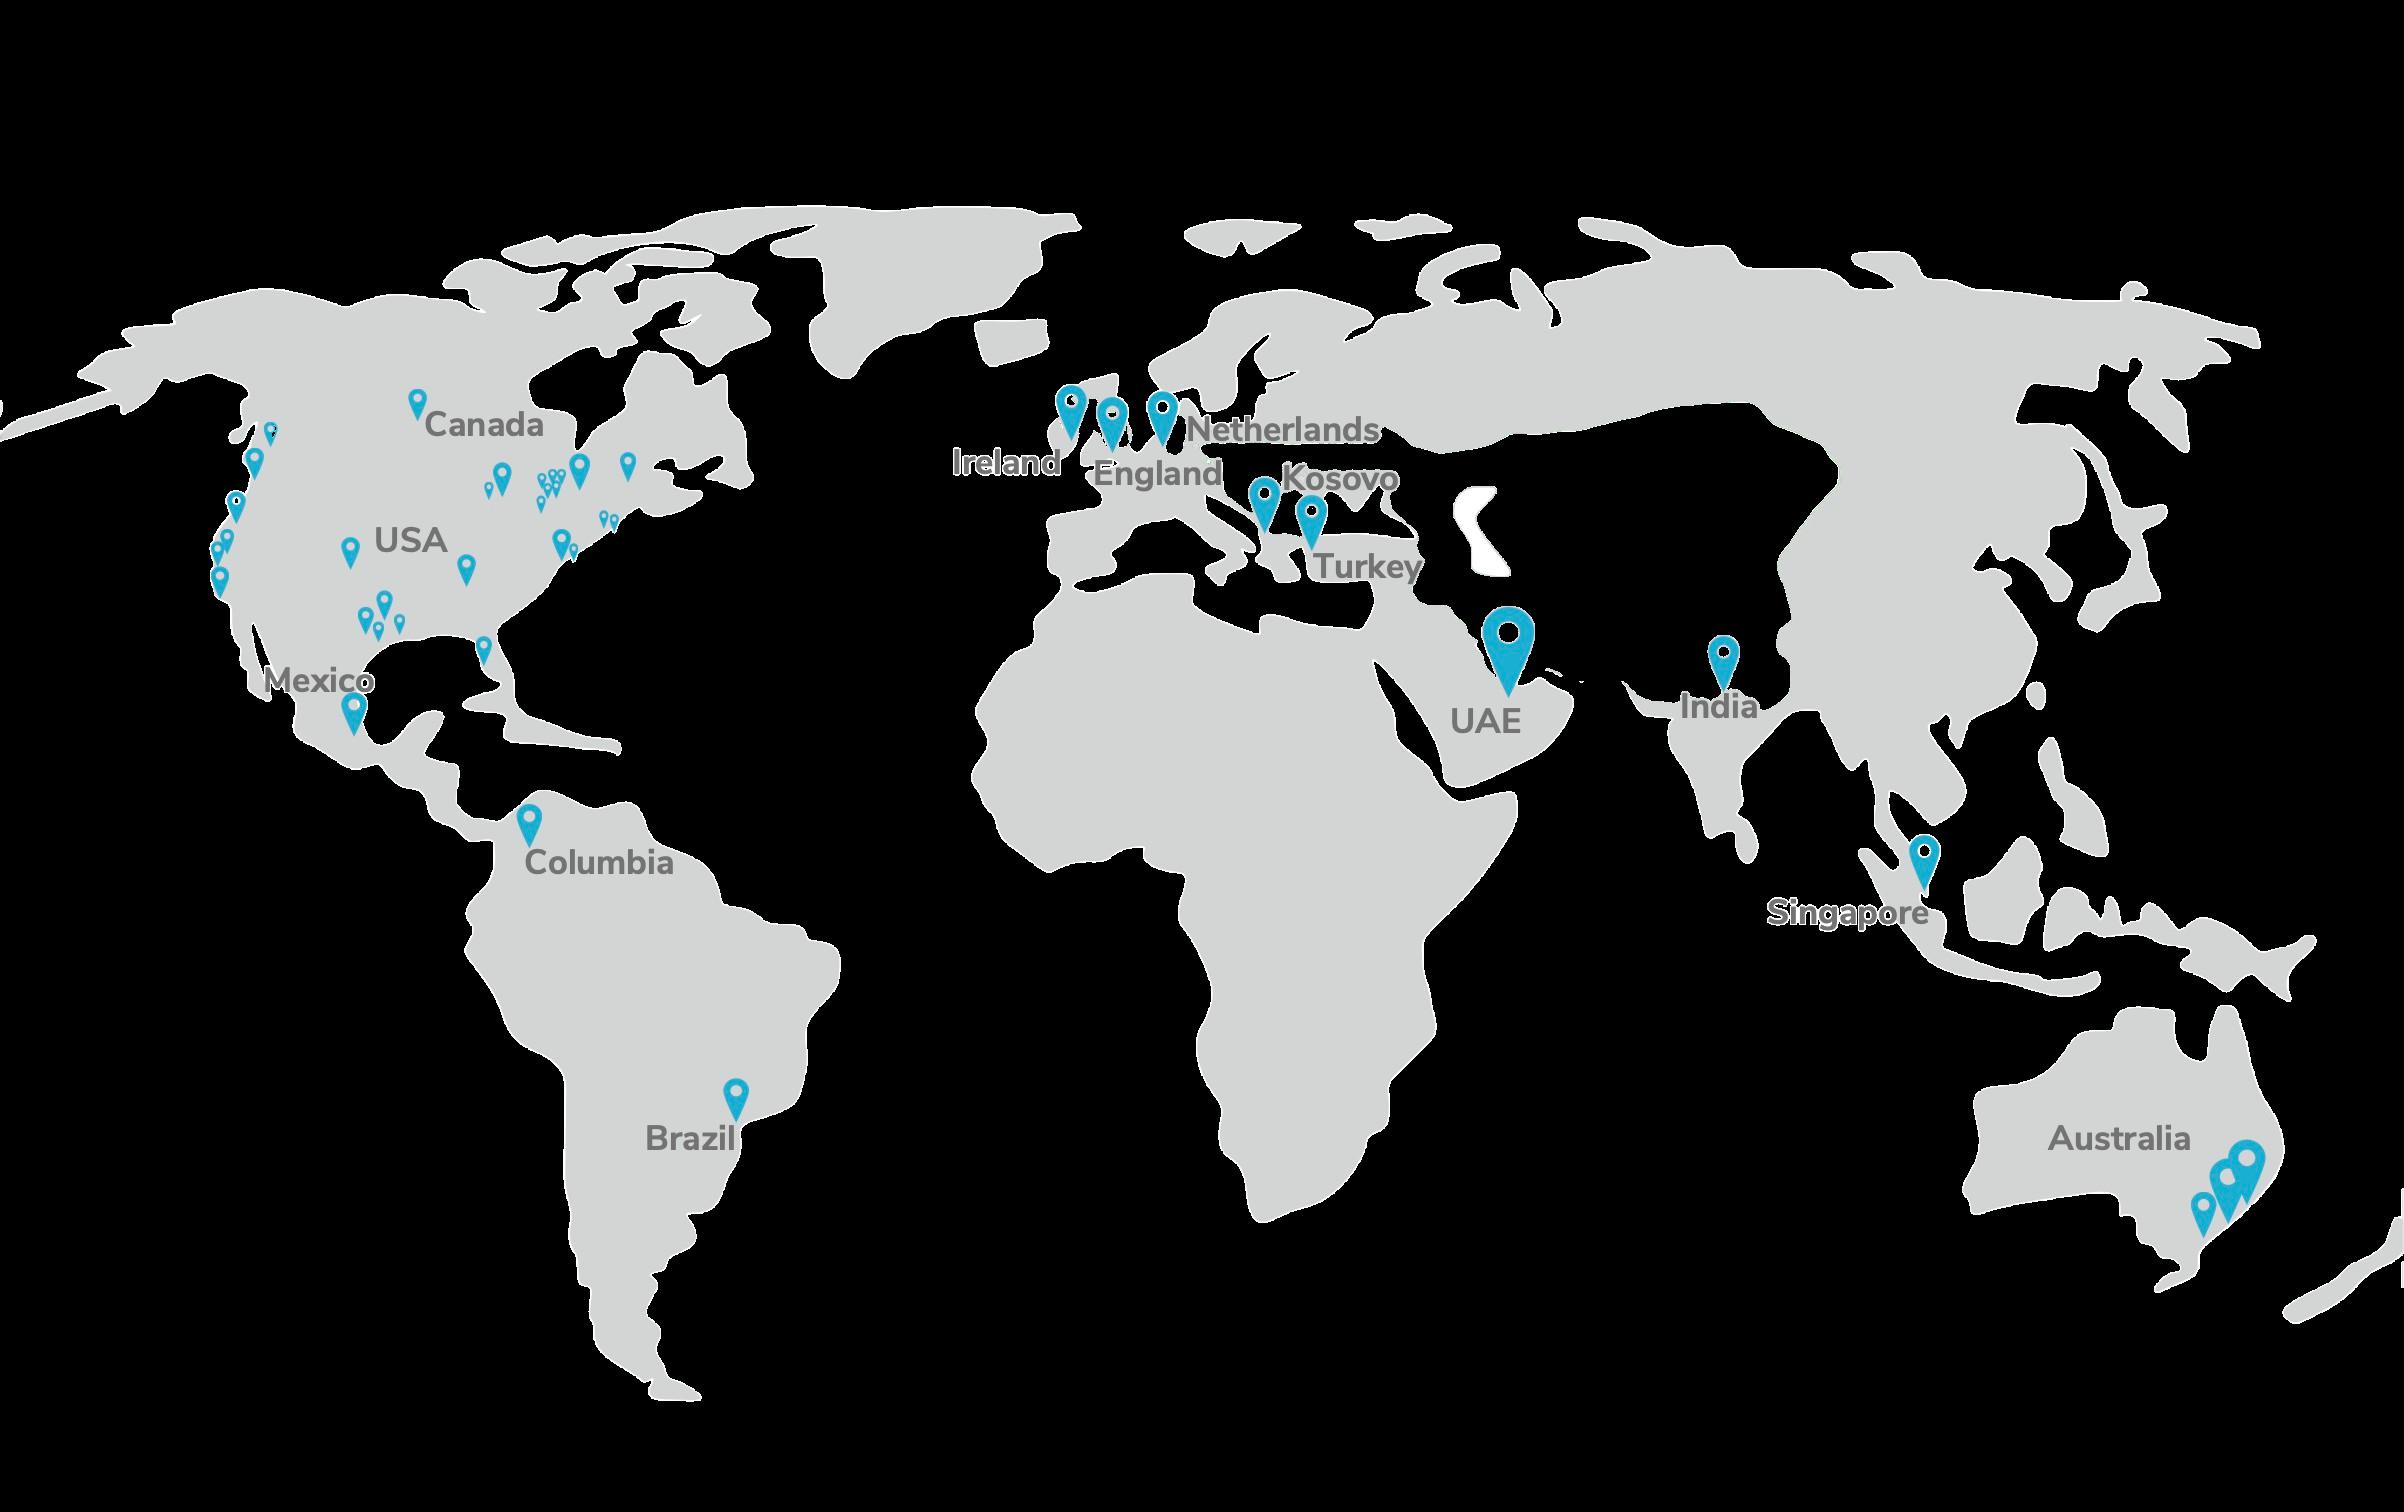 AgileBlue Global Partner Map